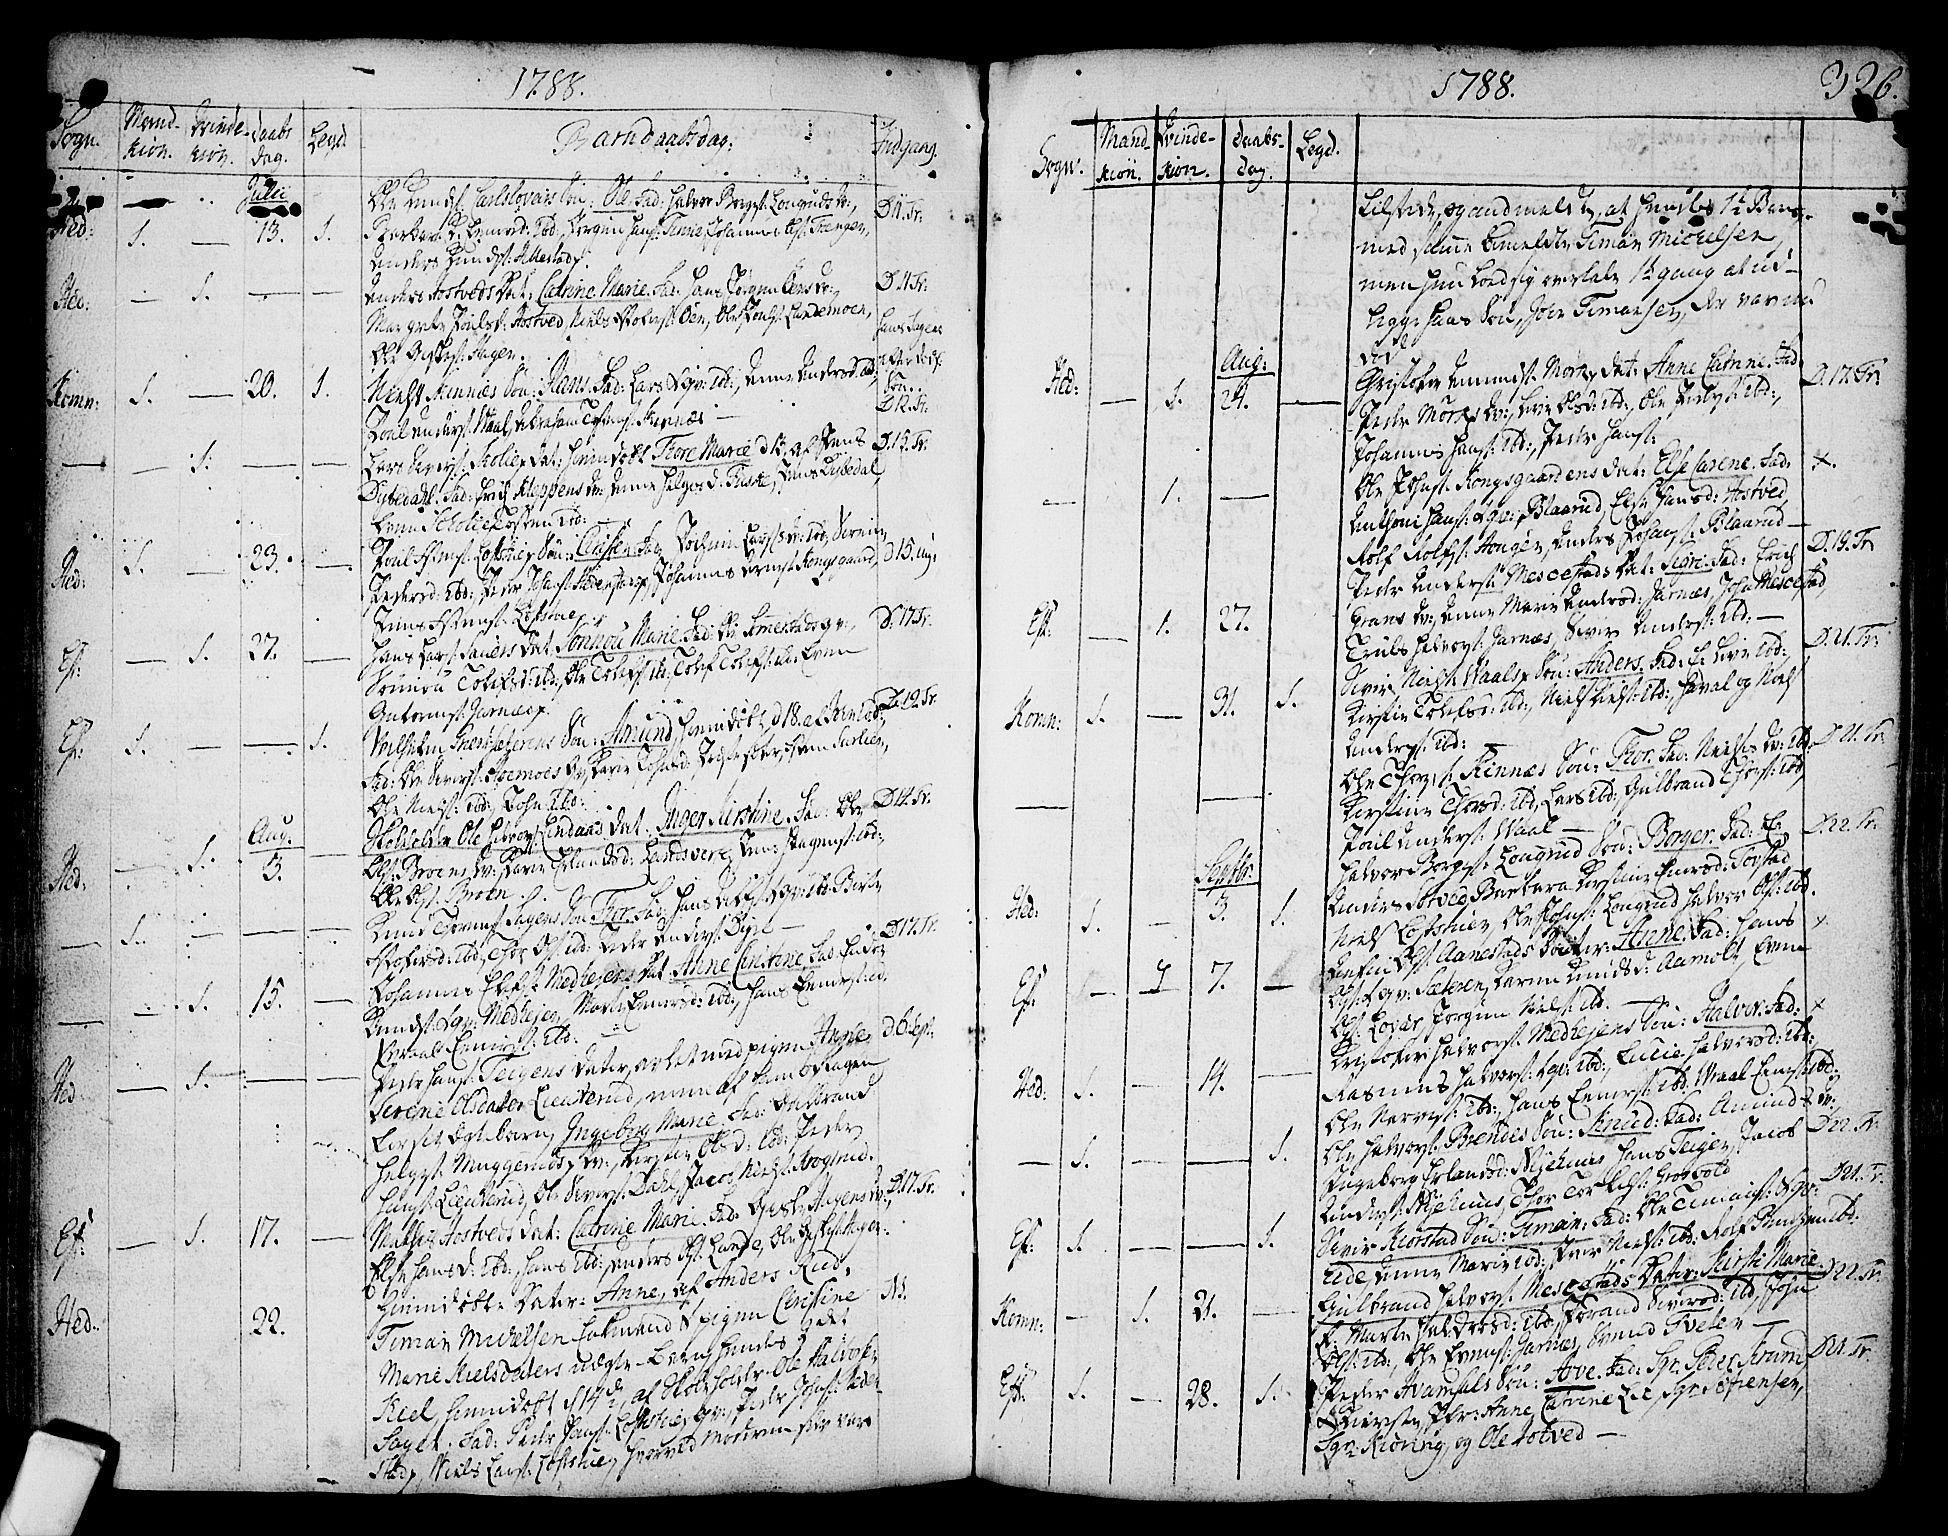 SAKO, Sandsvær kirkebøker, F/Fa/L0002a: Ministerialbok nr. I 2, 1725-1809, s. 326